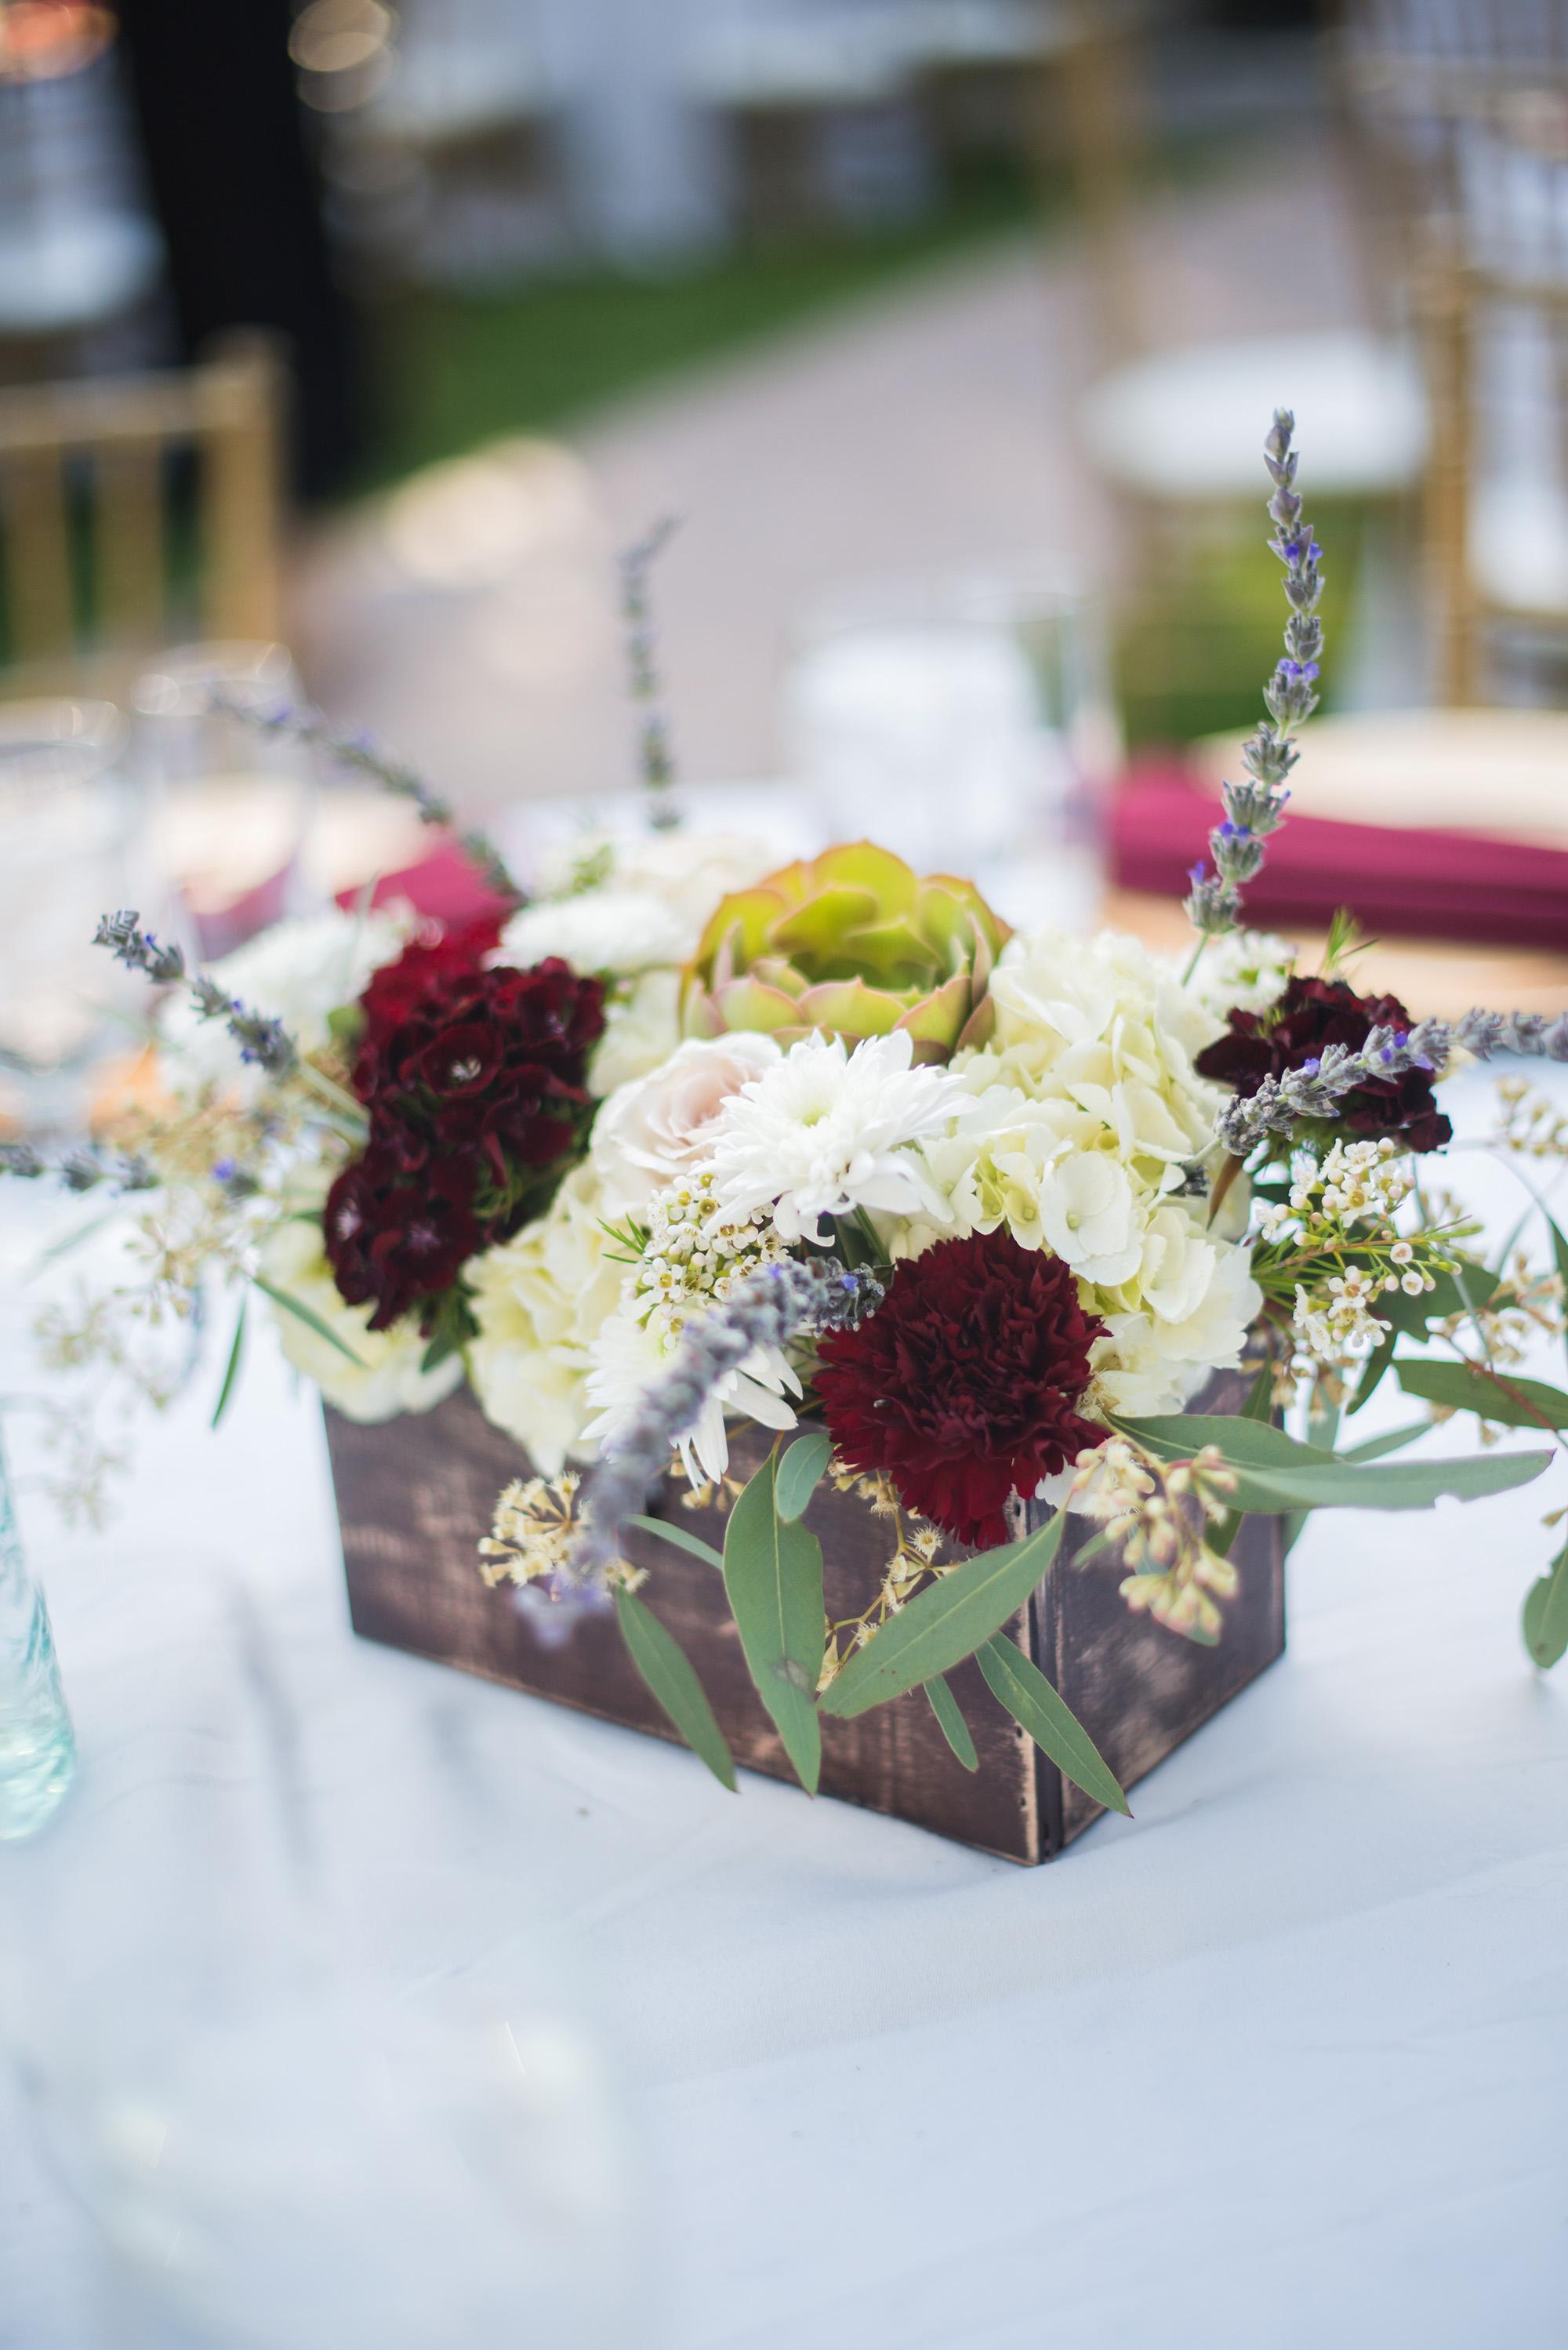 associate-photographer-christmas-house-wedding-carrie-vines-0148.jpg